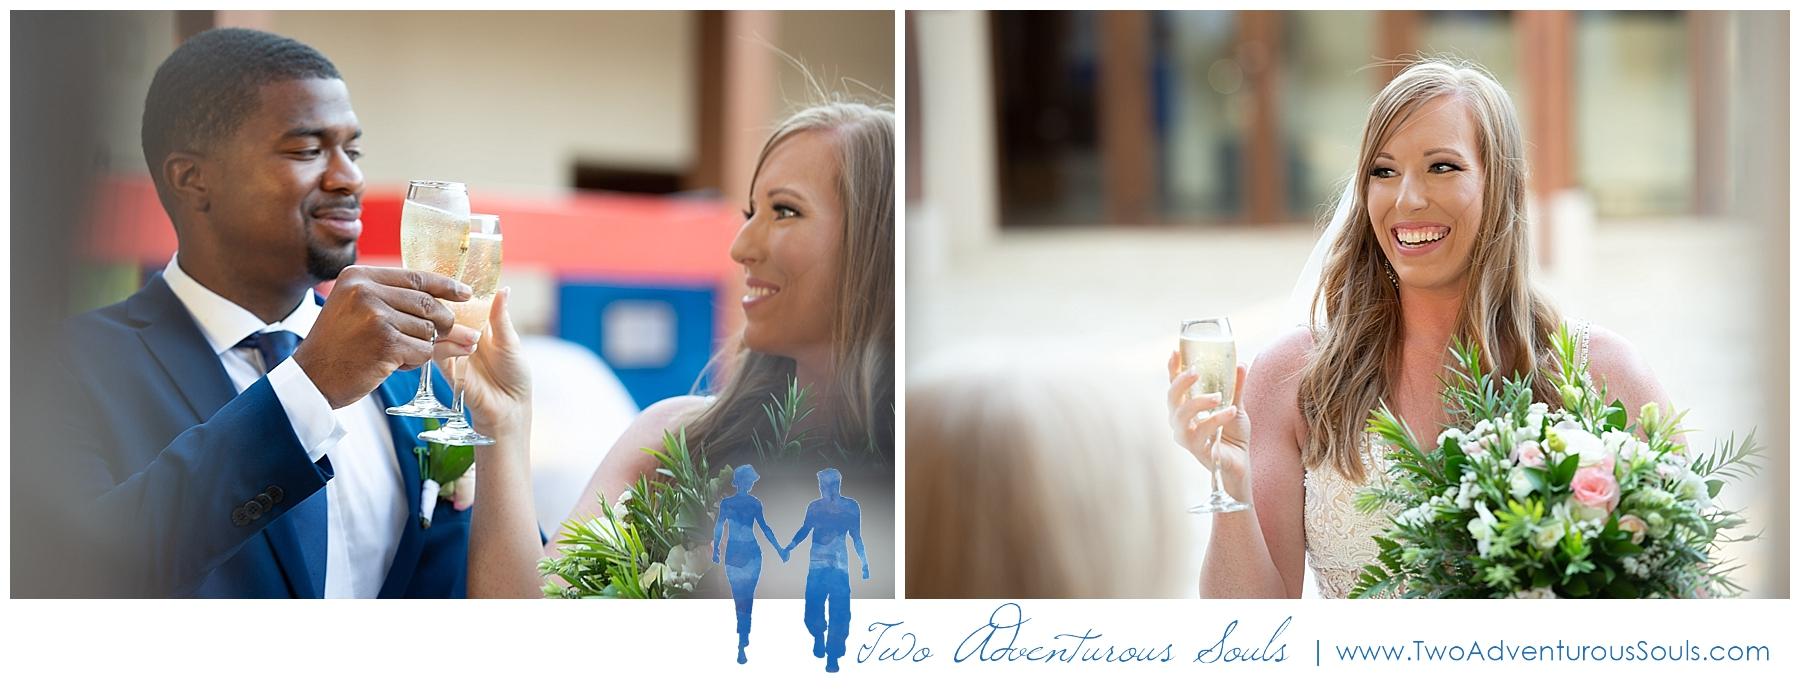 Costa Rica Wedding Photographers, Dreams las Mareas Wedding, Destination Wedding Photographers, Two Adventurous Souls - 022219_0029.jpg